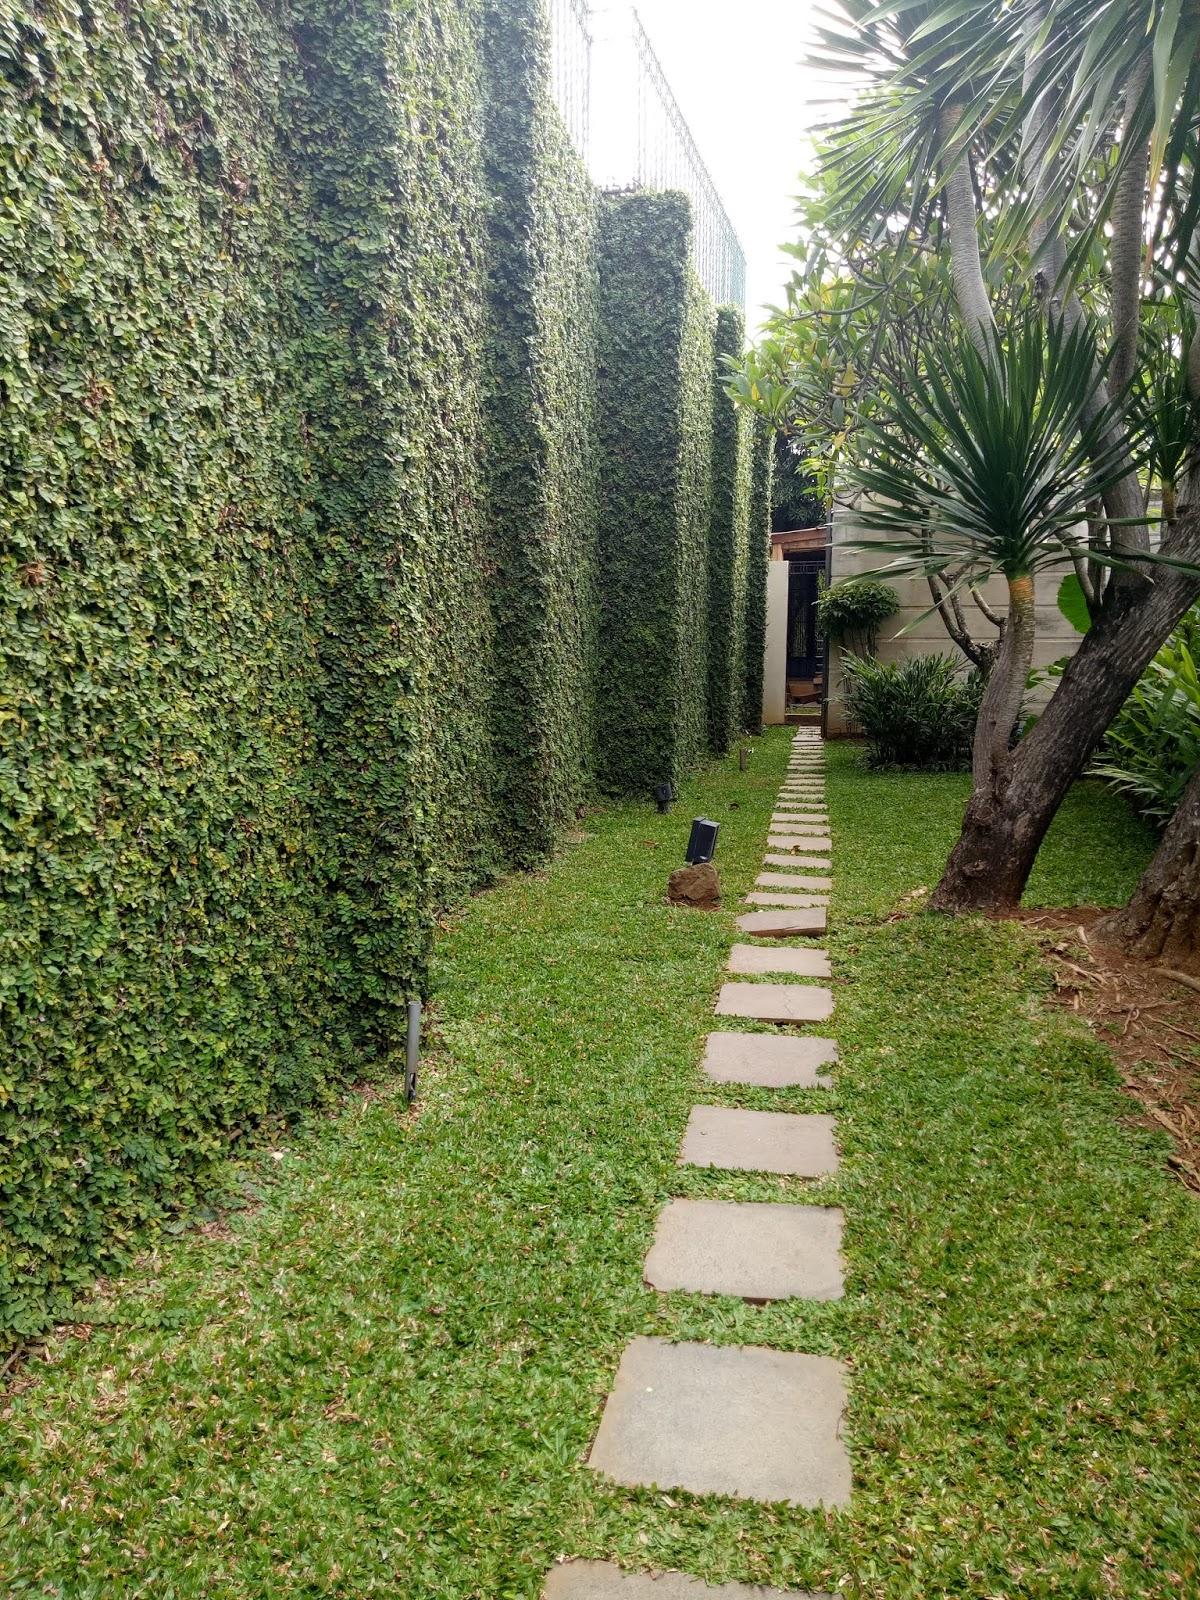 Tanaman Dolaran Atau Pacar Tembok Atau Ficus Repens Dan Ficus